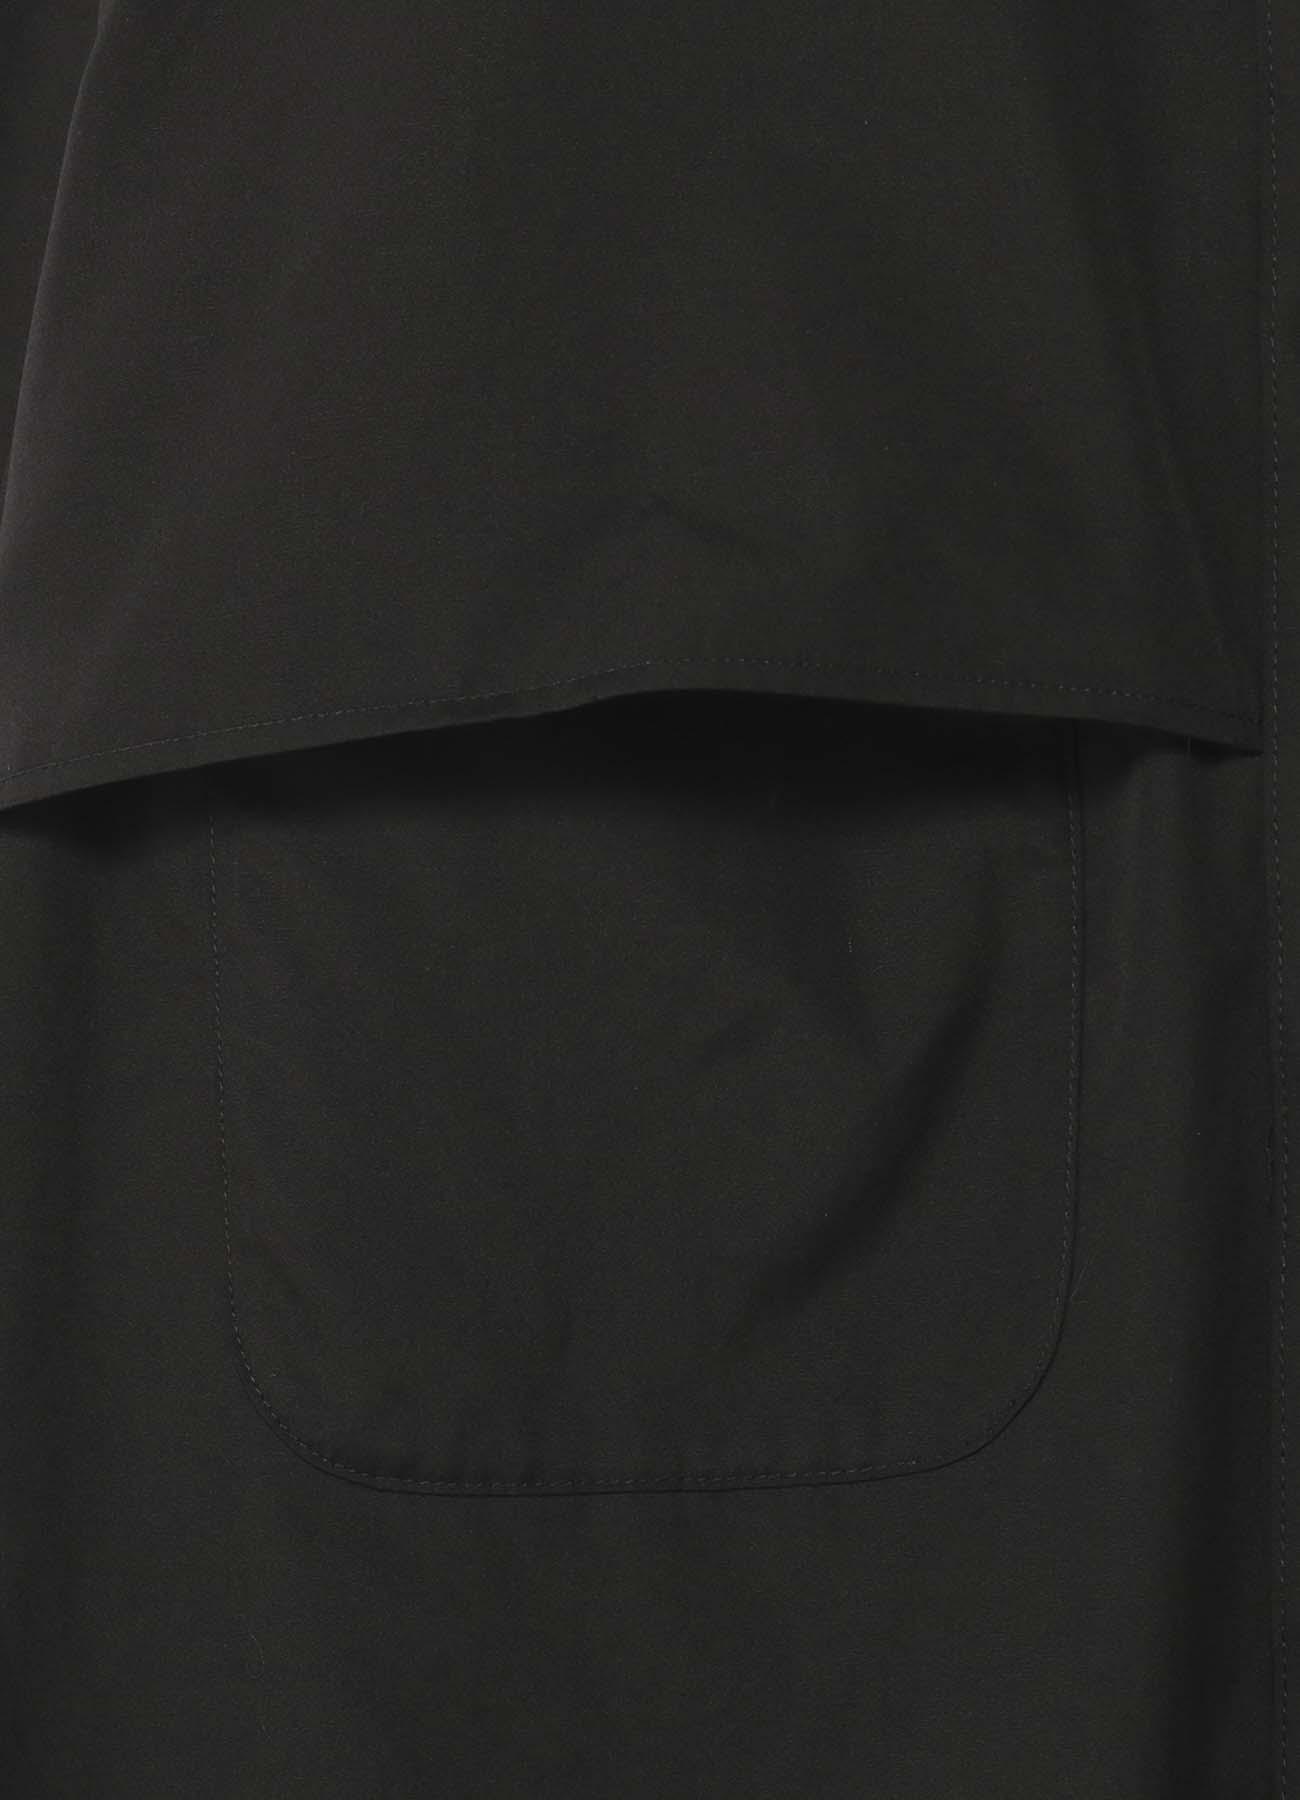 100/2 Broad Storm Shield Double Pocket Shirt